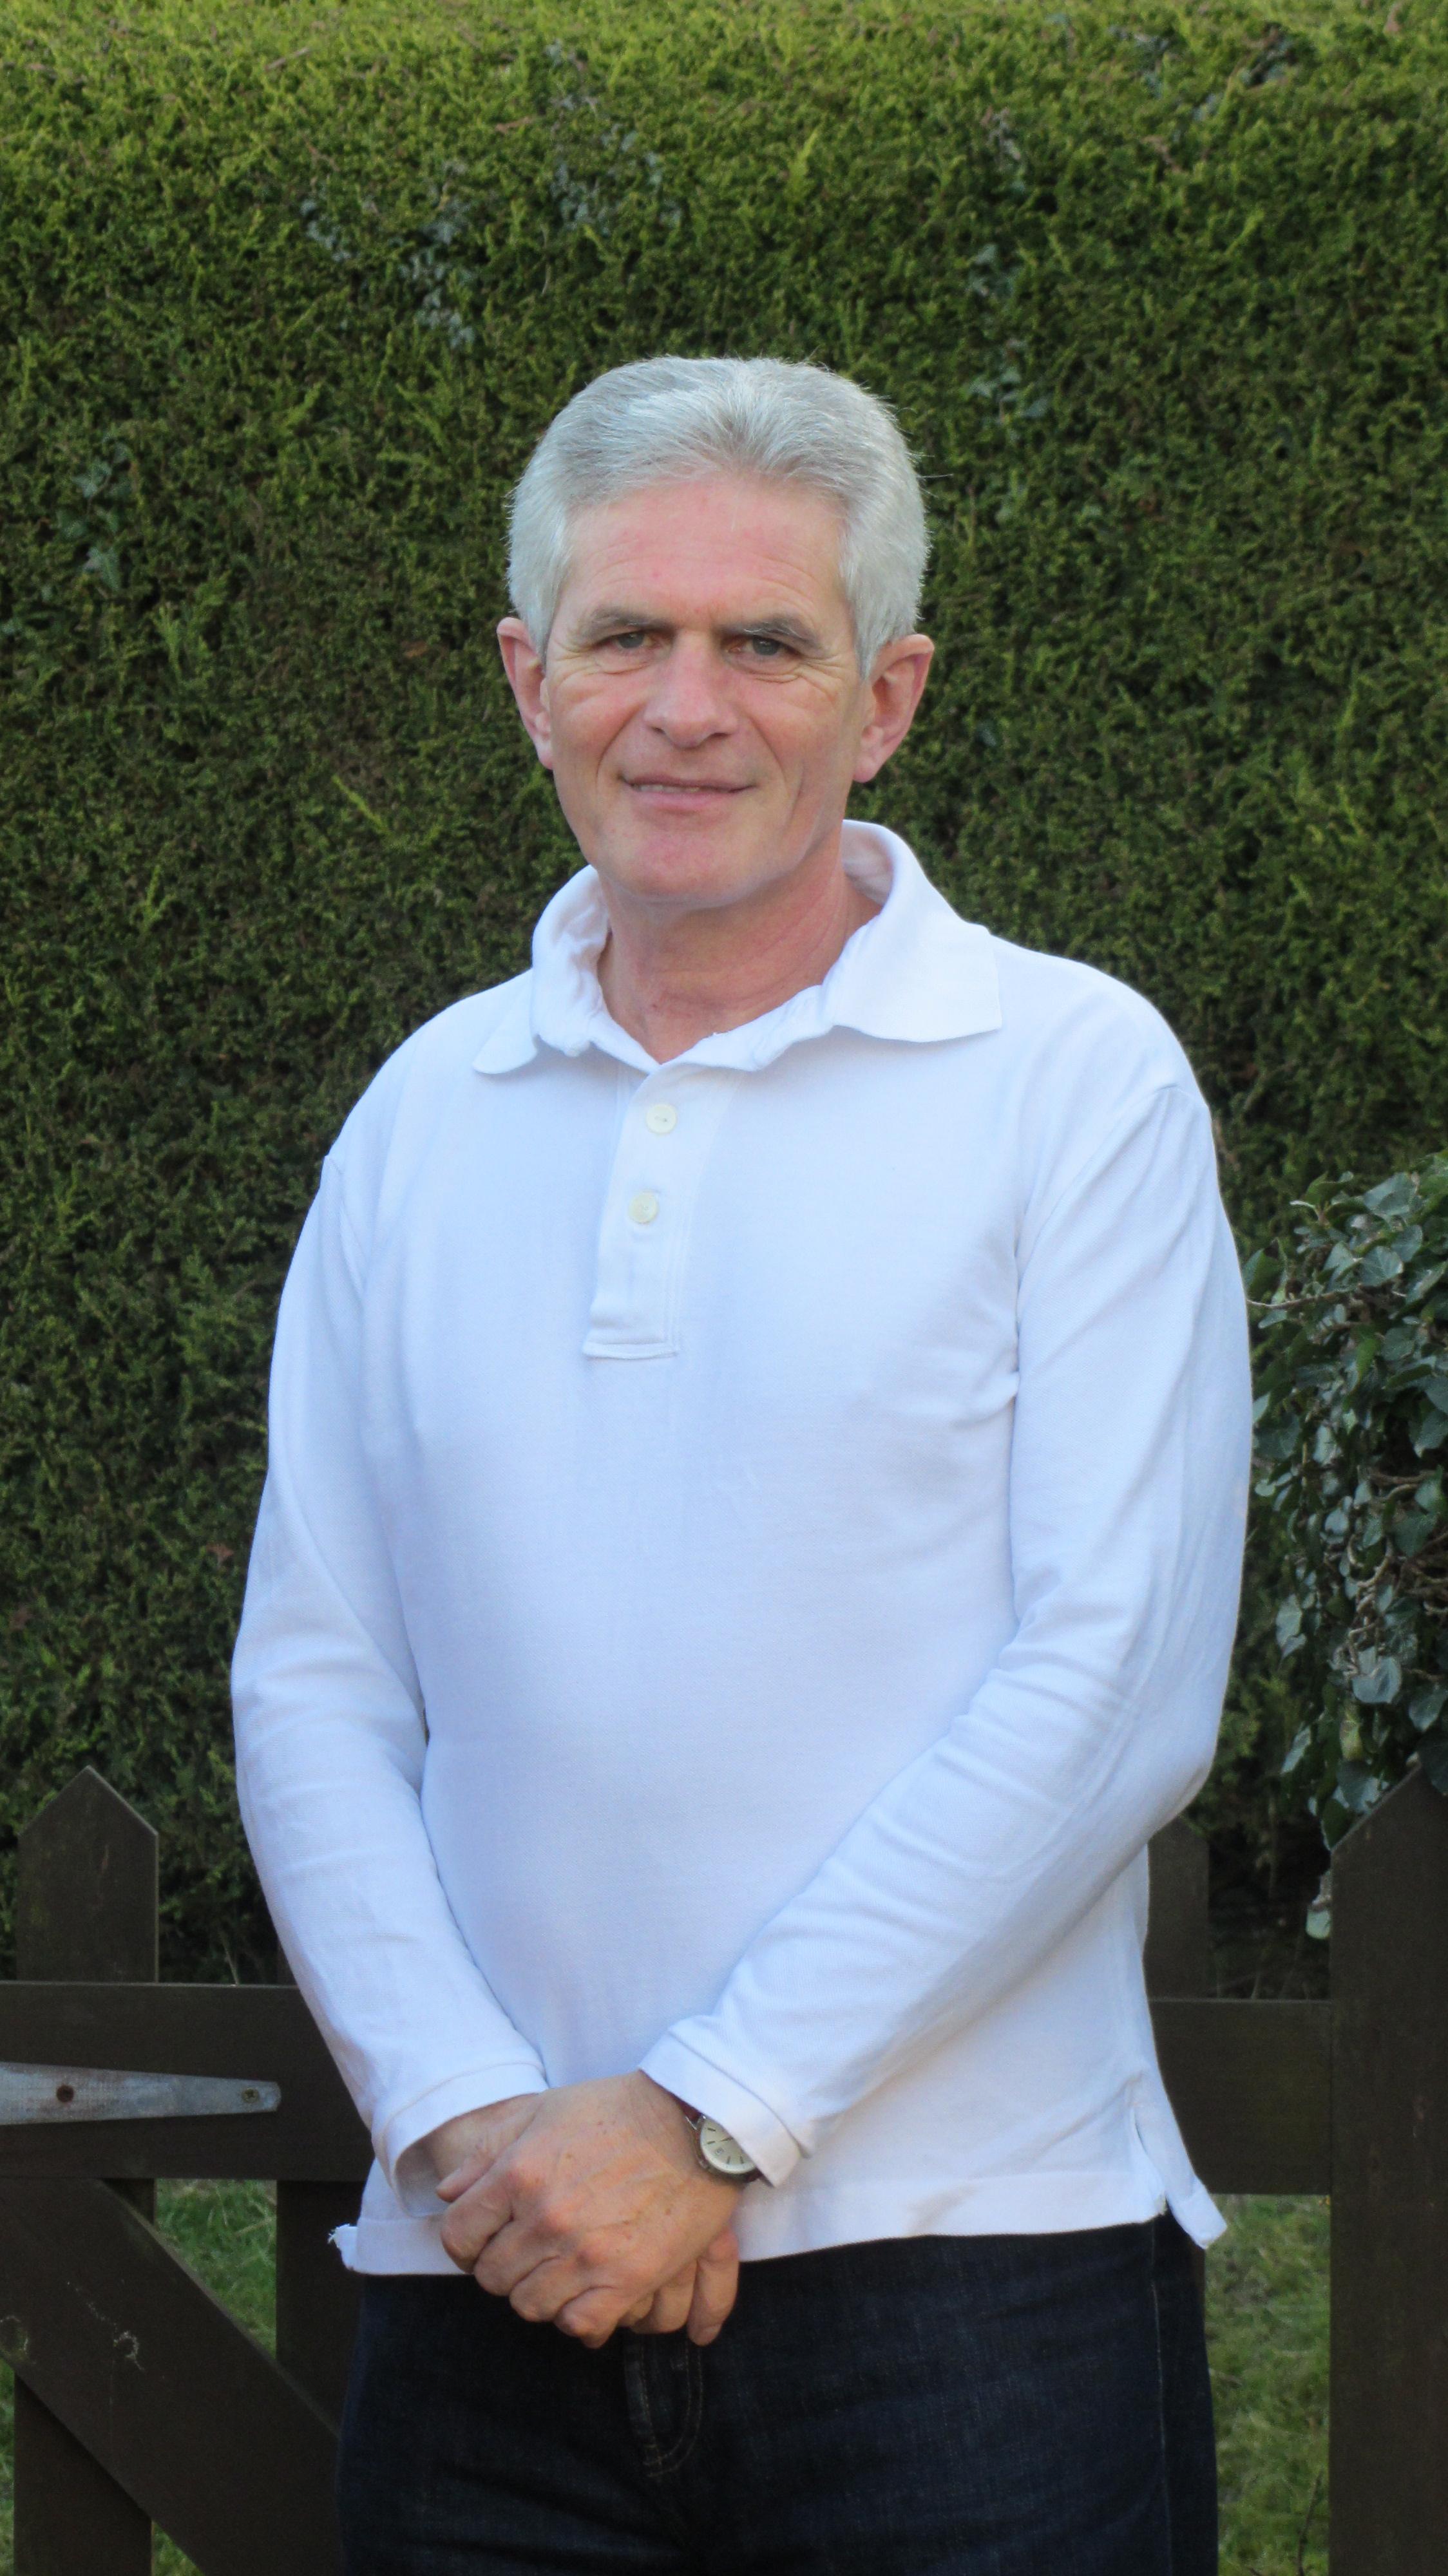 Dad's polo shirt